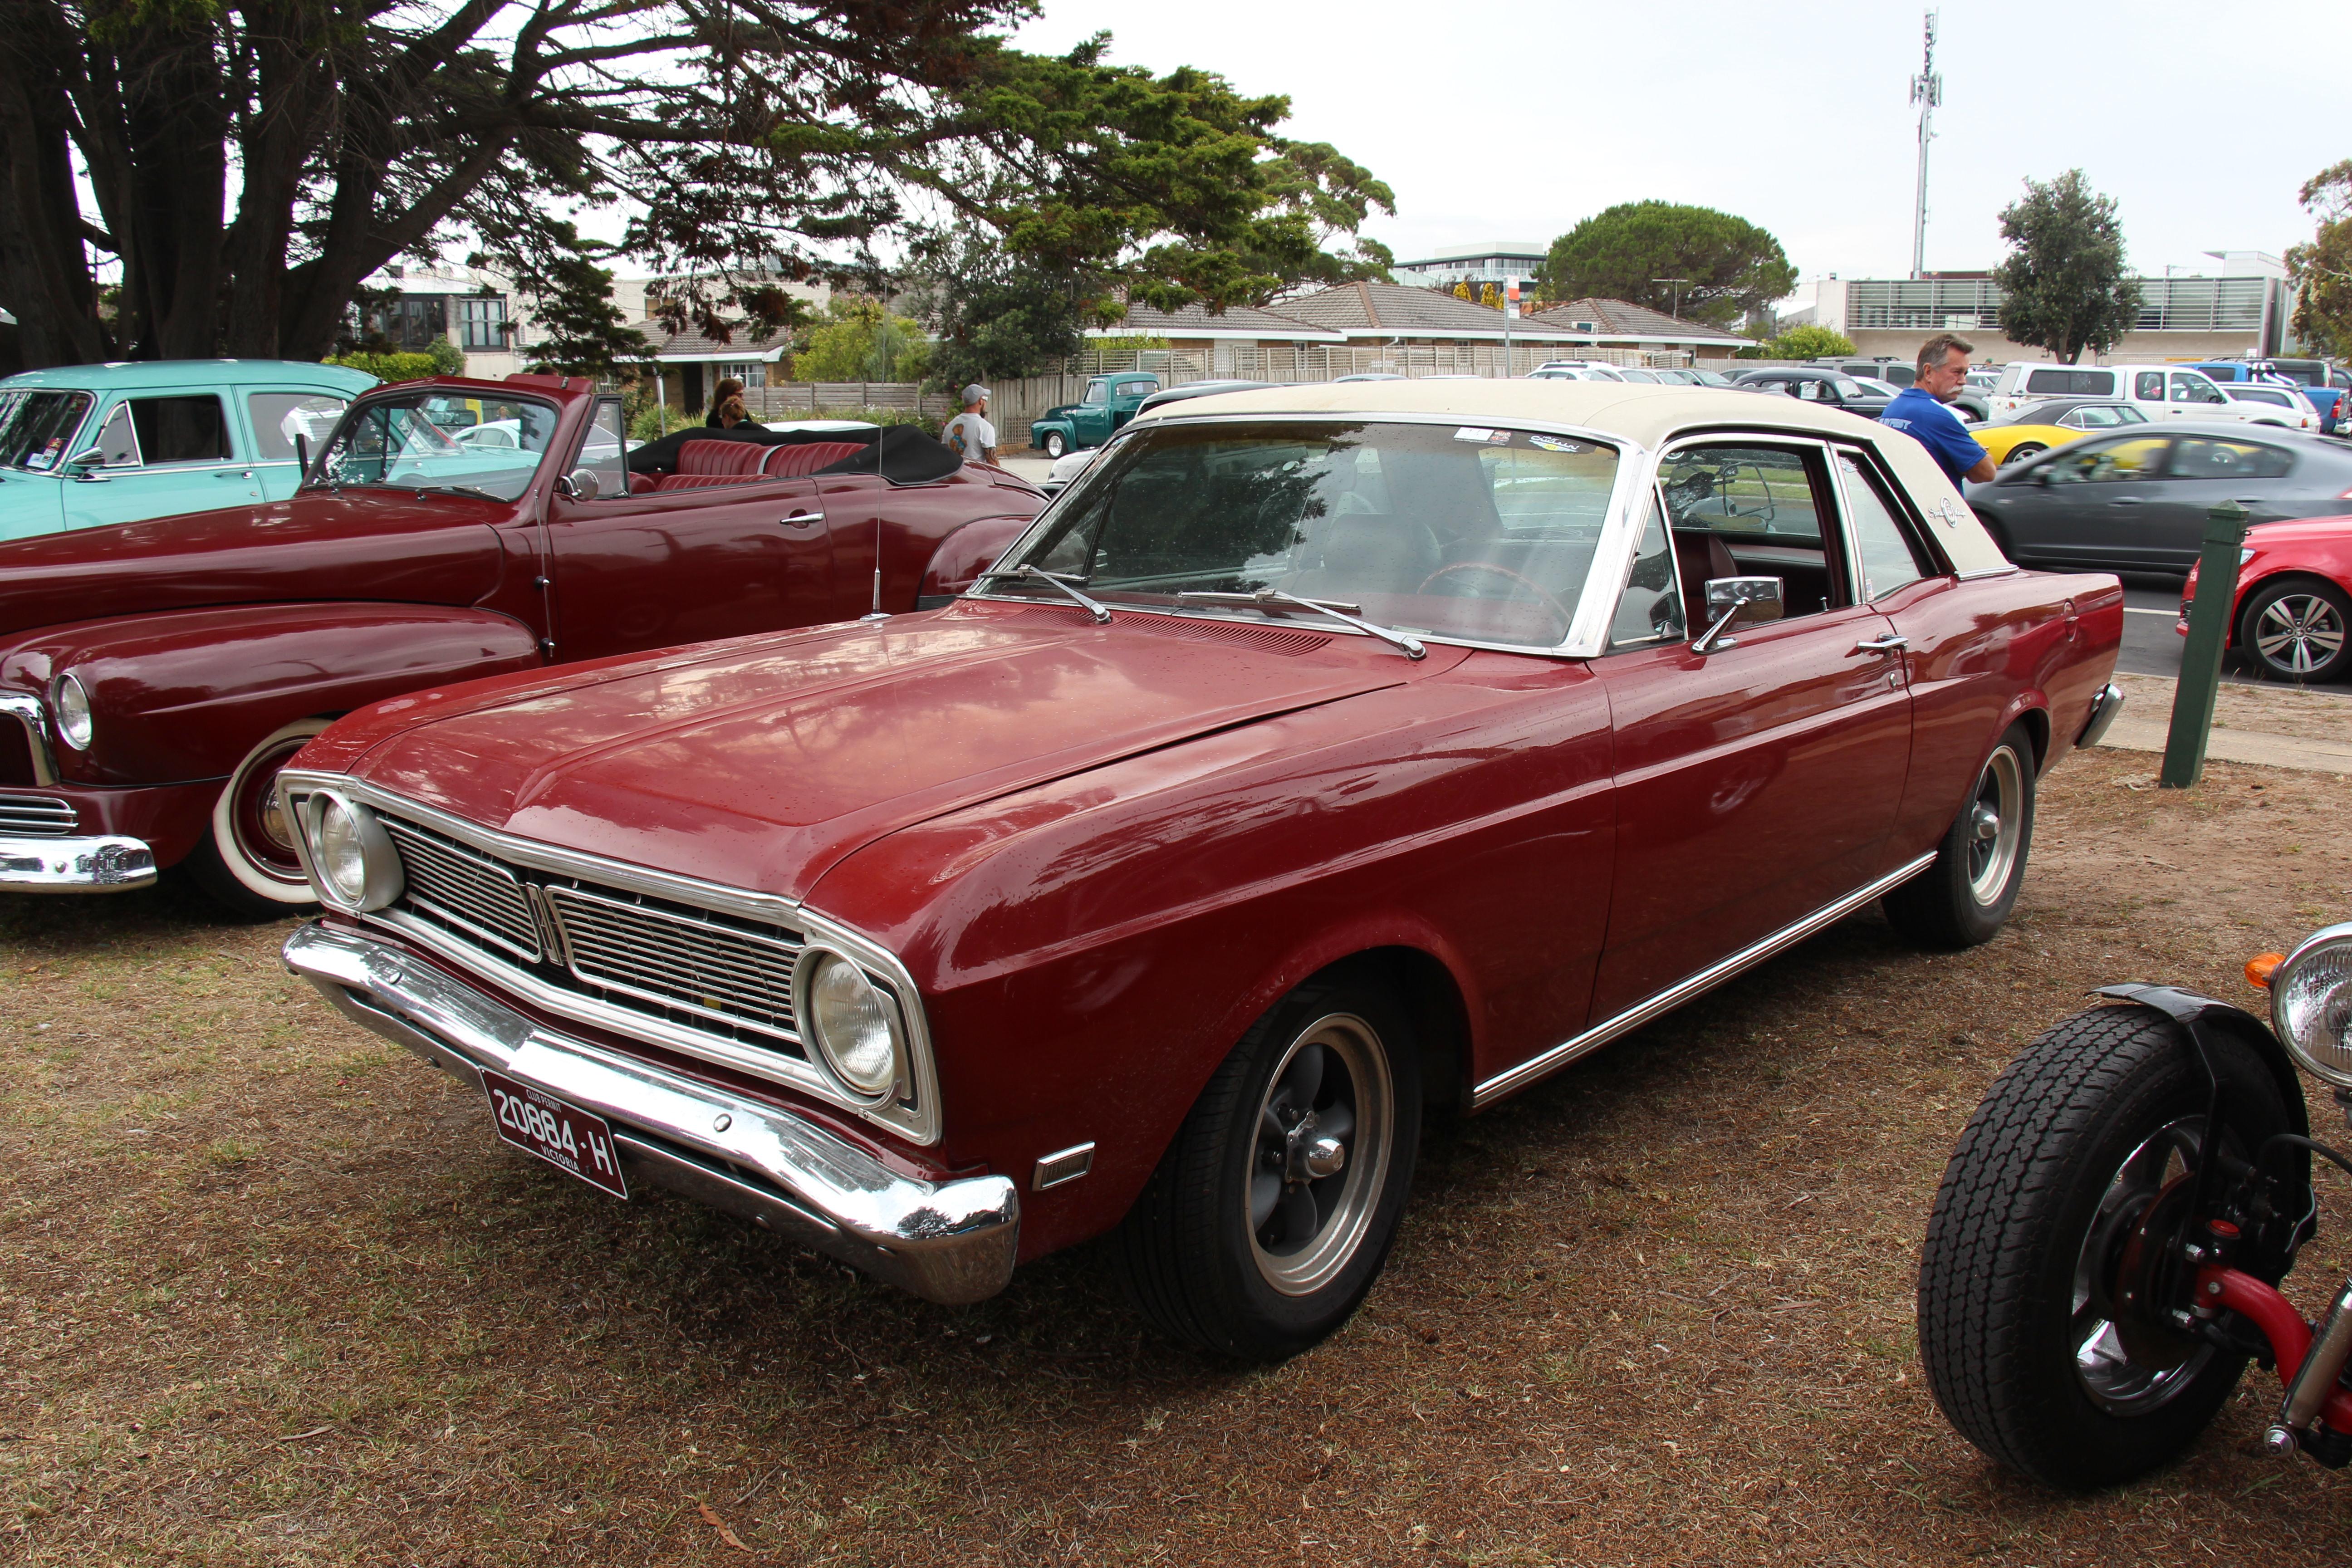 File:1969 Ford Falcon Sport Coupe (16190318116) jpg